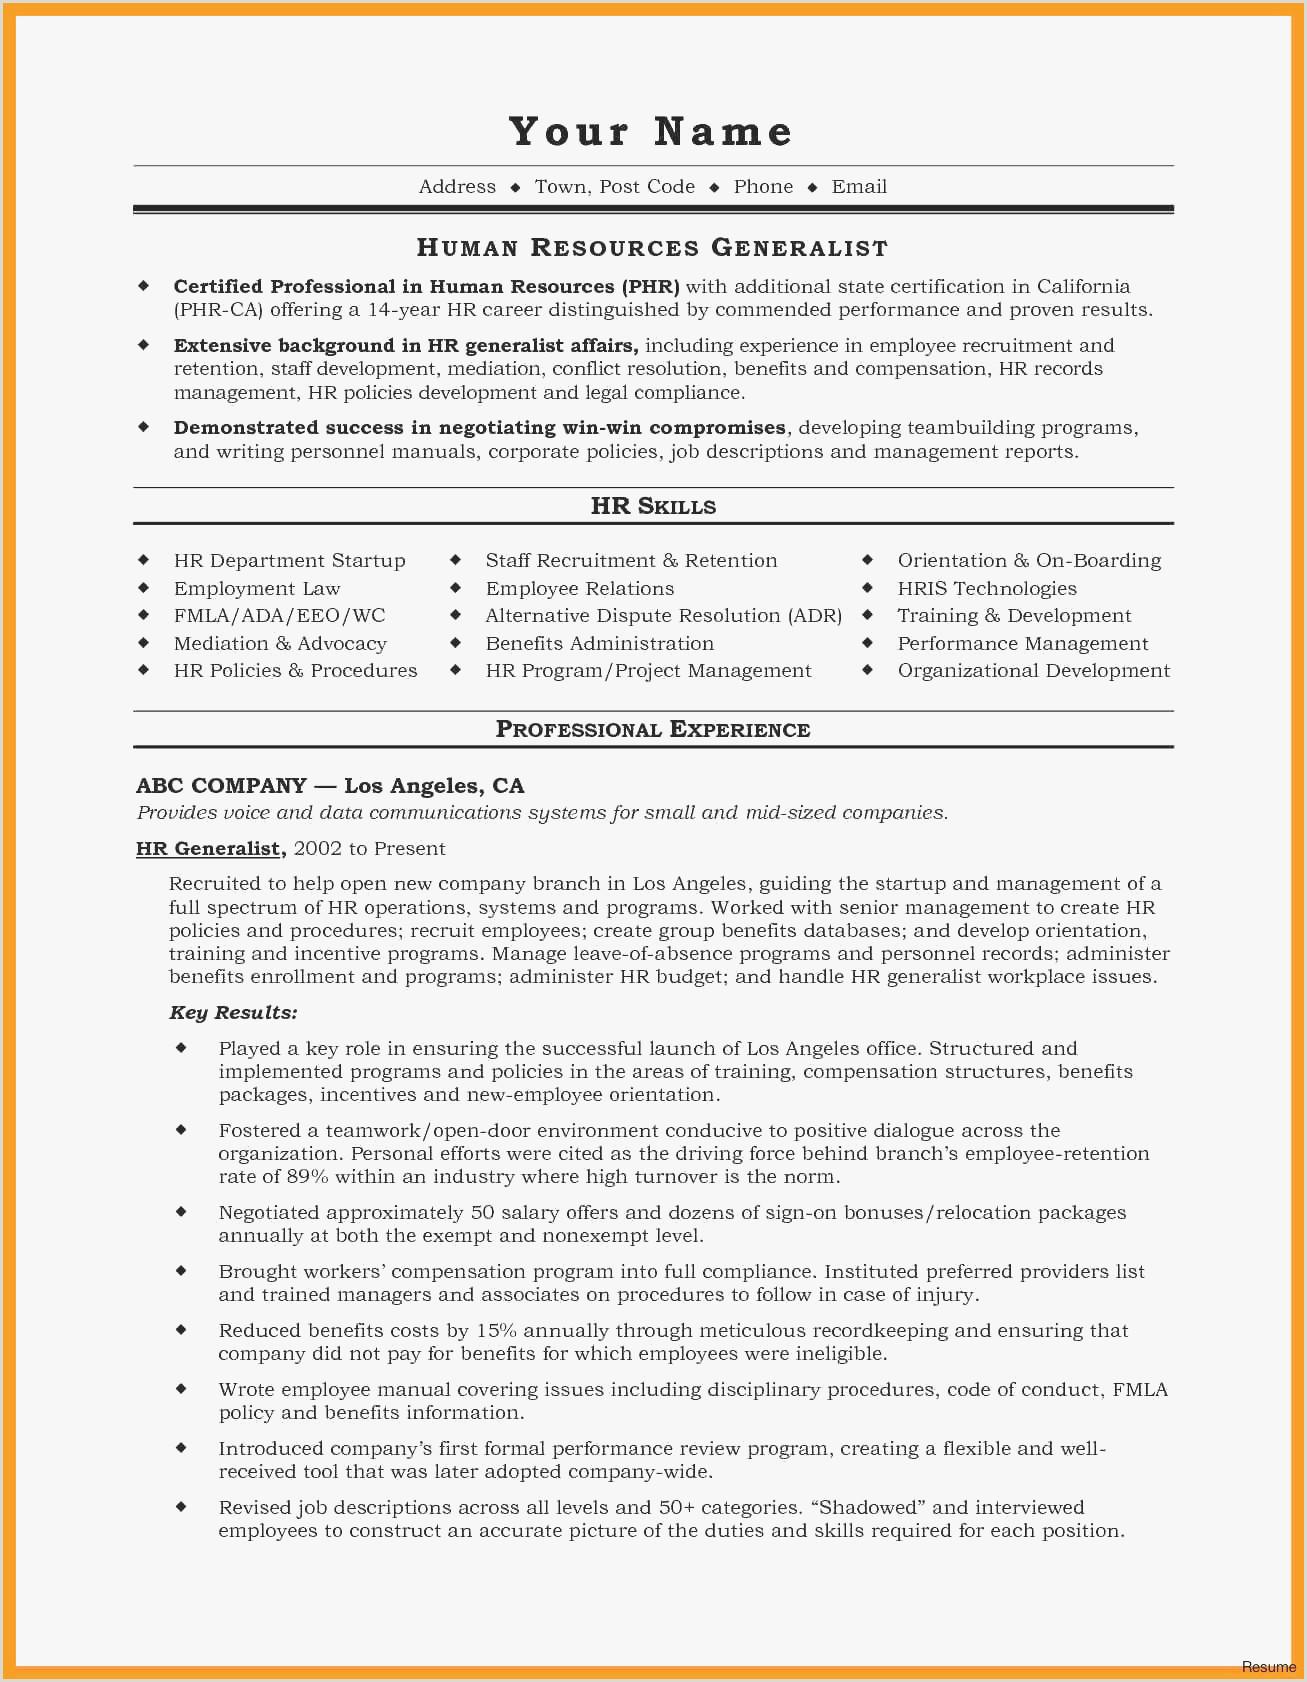 Resume Format For First Job Administrative Jobs Resume Sample – Salumguilher